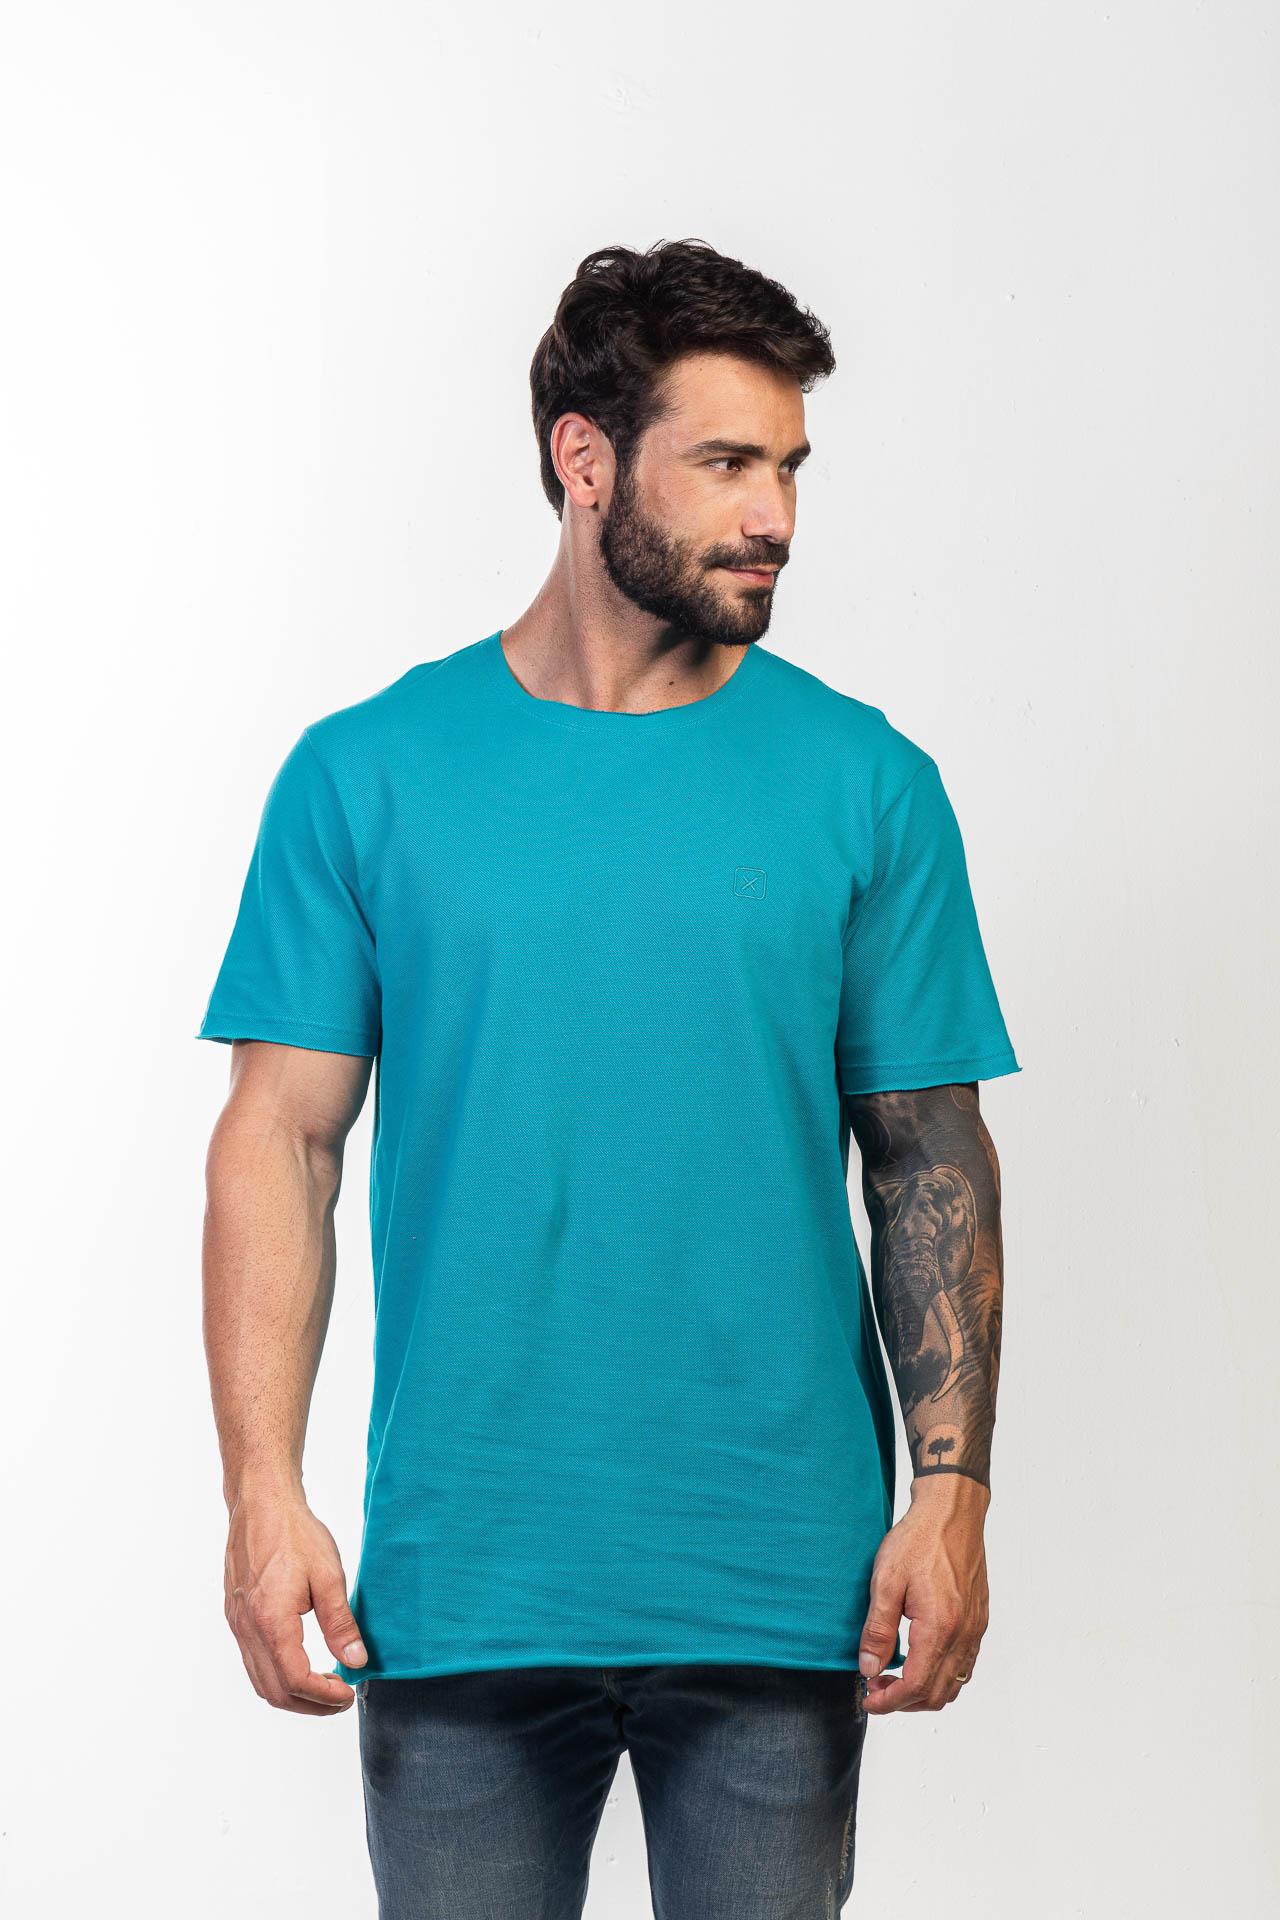 Camiseta Masculina TXC 19572